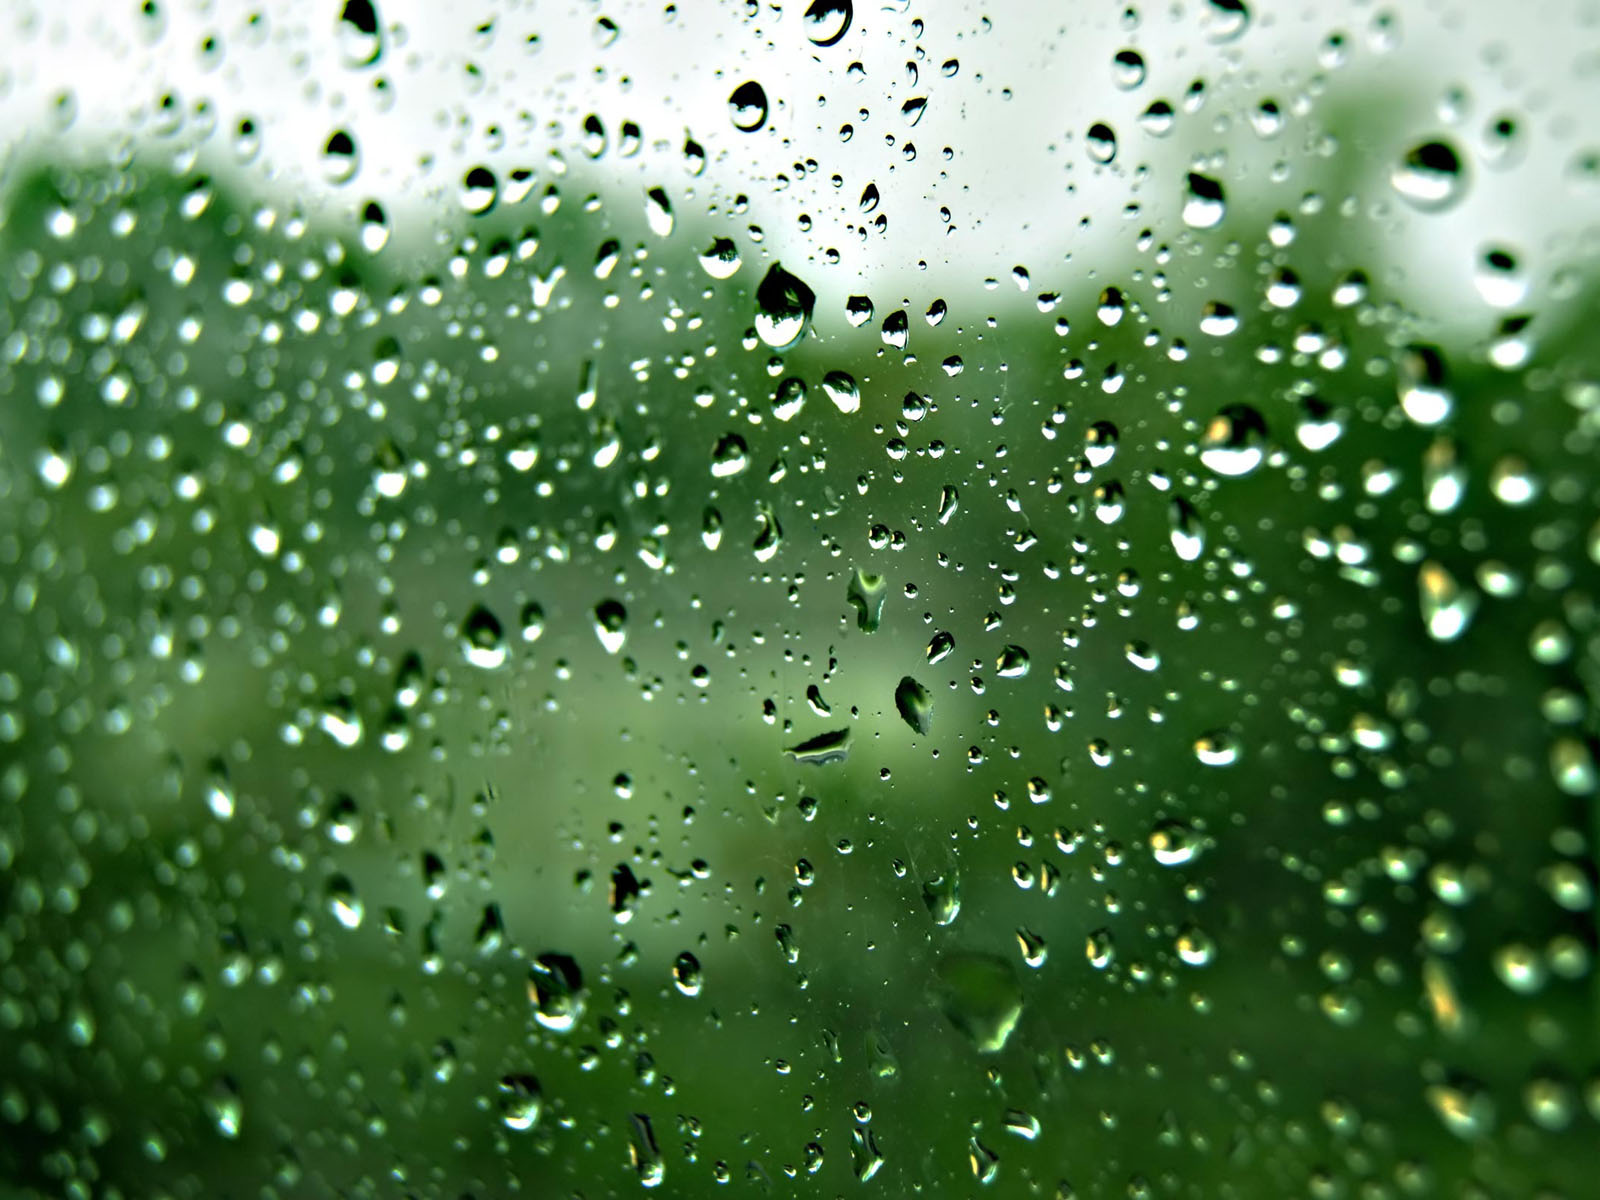 Rain Drops on Glass Wallpapers Desktop Wallpaper 1600x1200